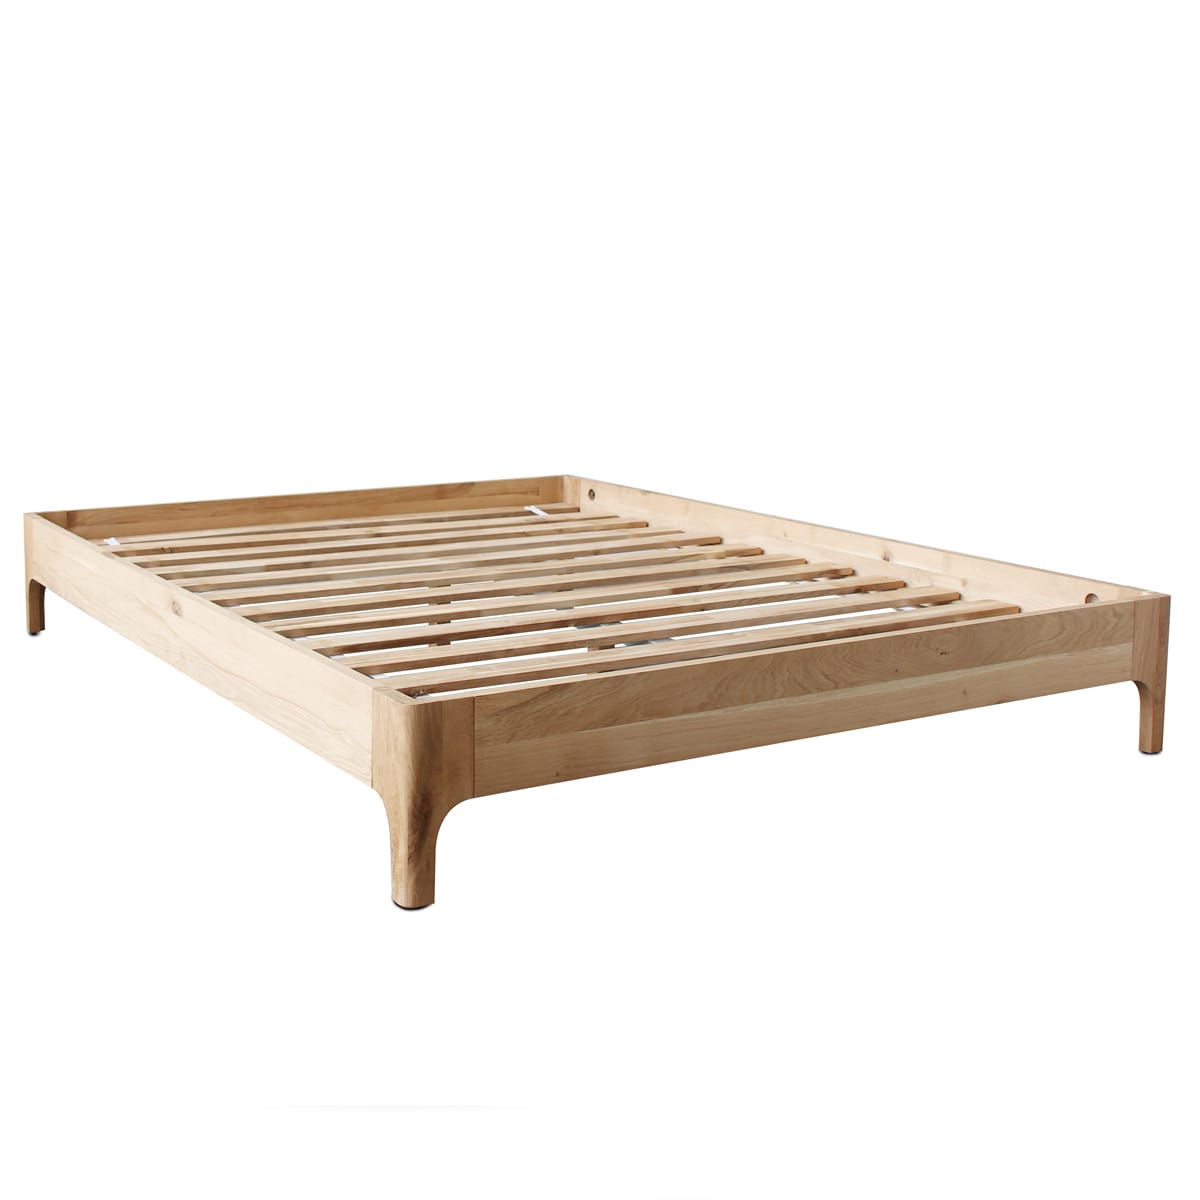 Ambience Queen Bed Base - Oak